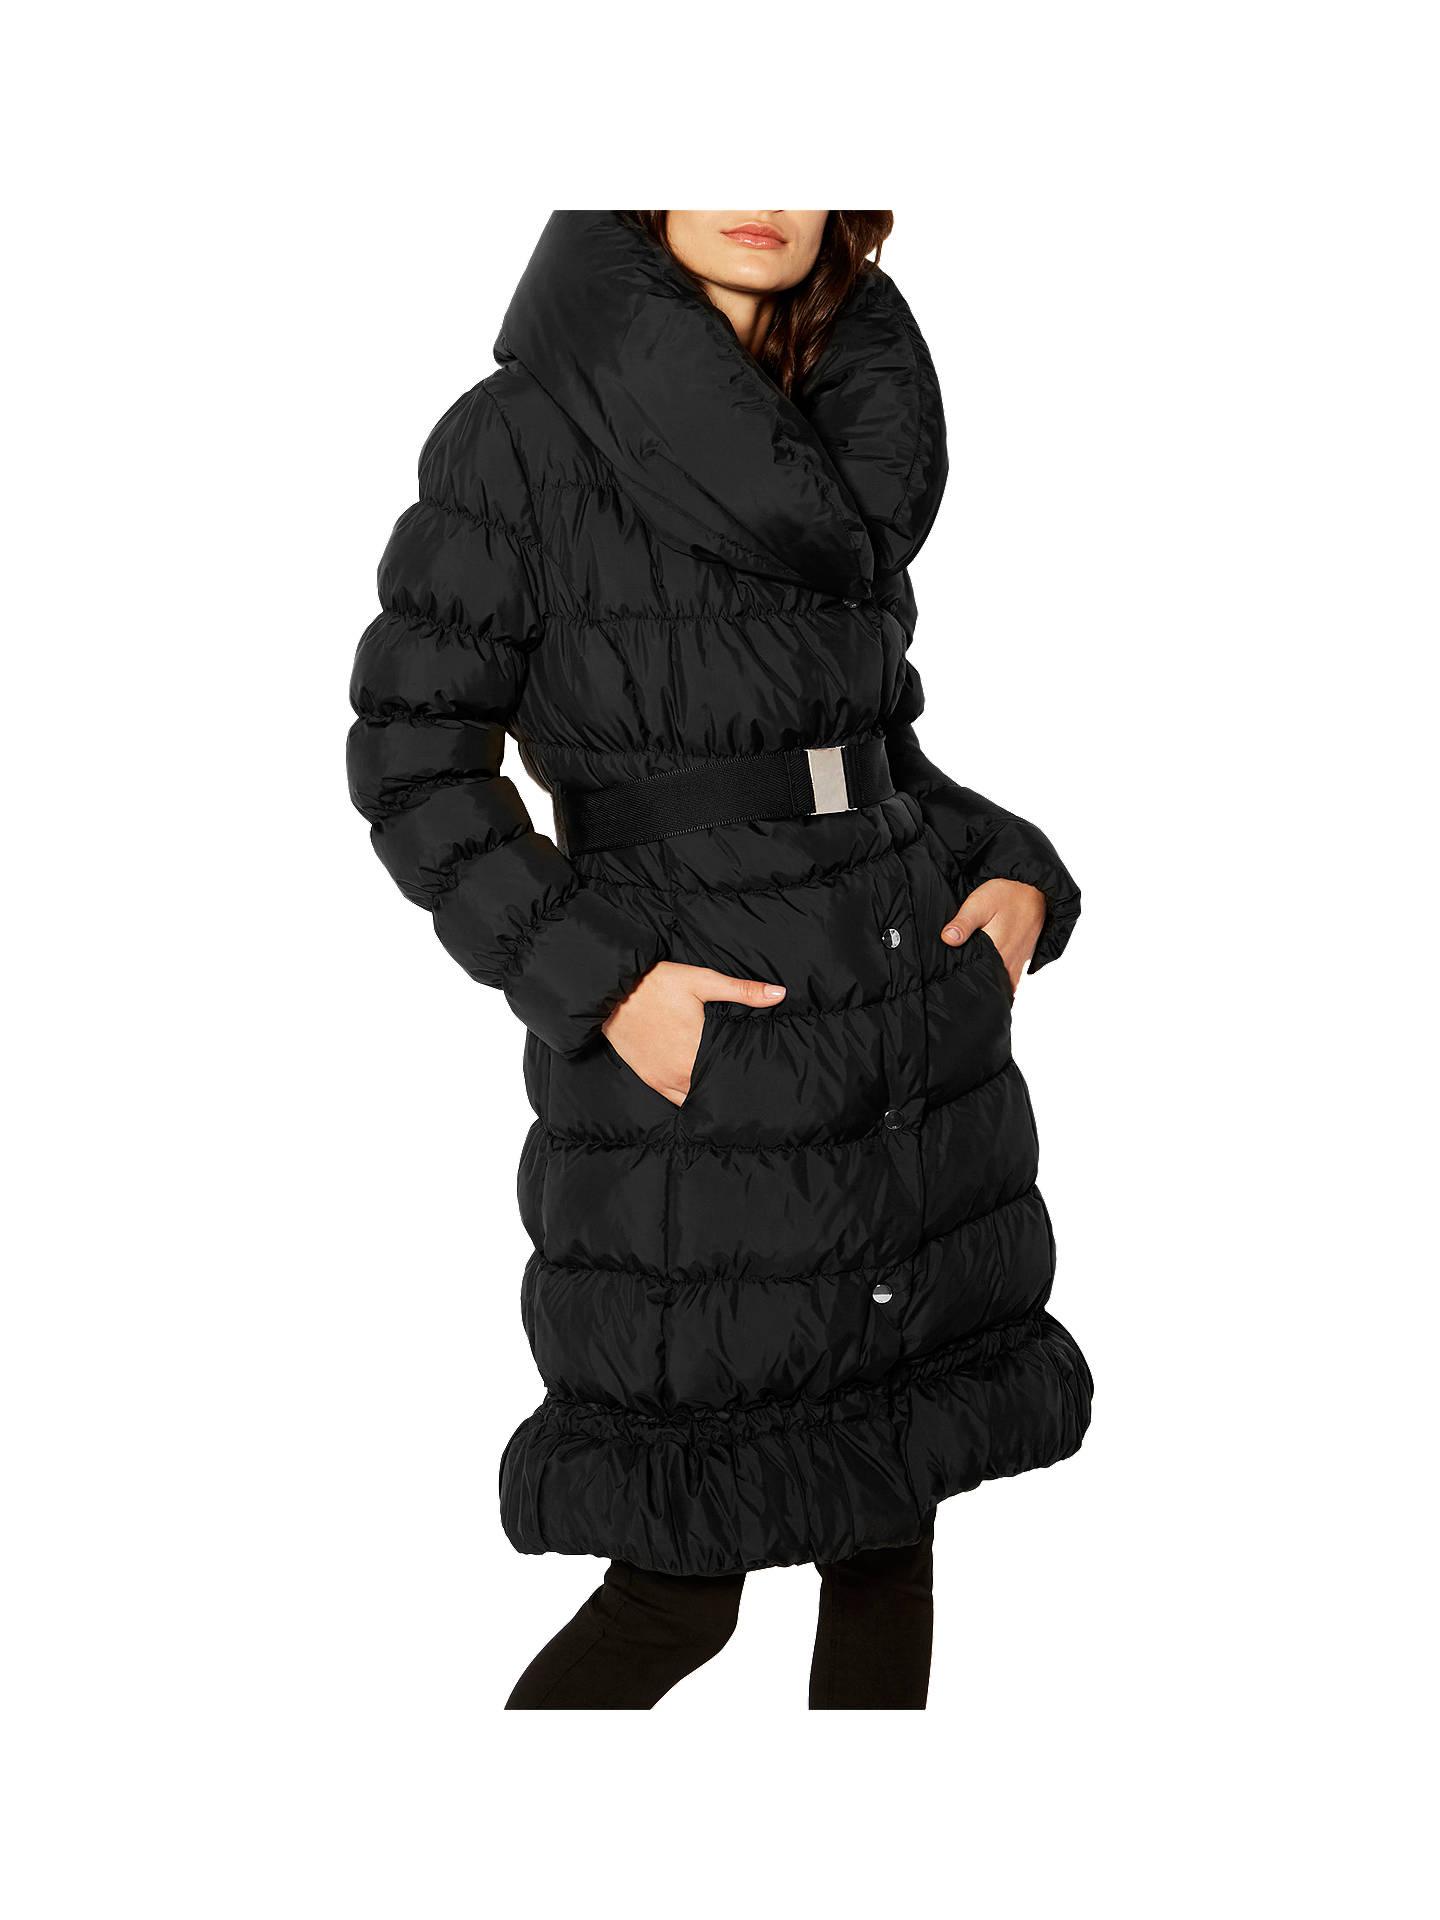 ae2a3301bc9 Buy Karen Millen Feather Filled Puffer Coat, Black, 6 Online at  johnlewis.com ...